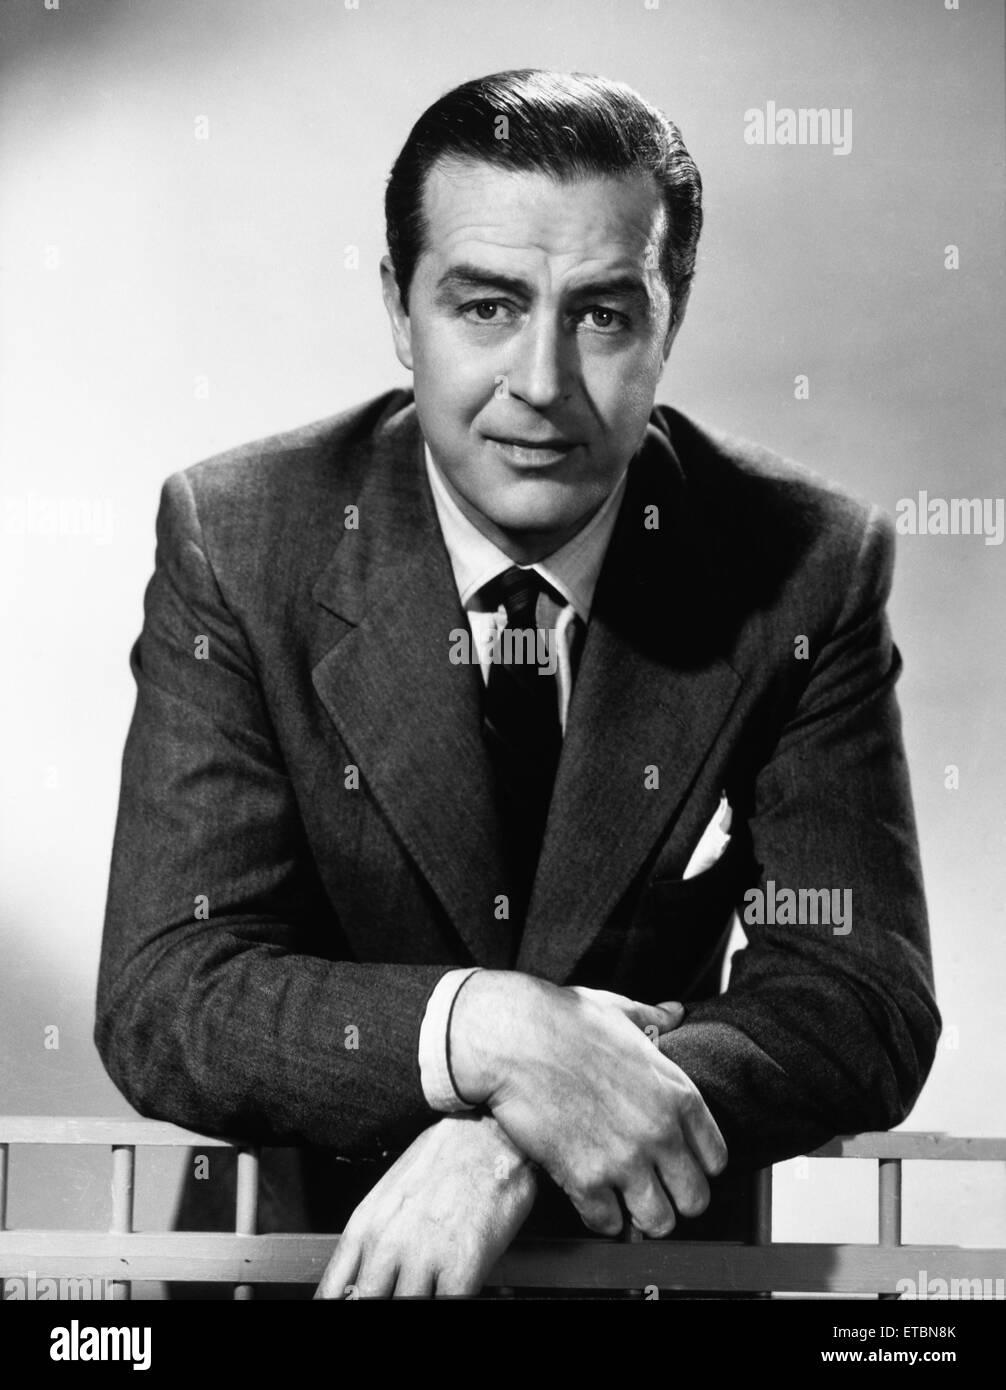 Schauspieler Ray Milland, Portrait, 1951 Stockbild